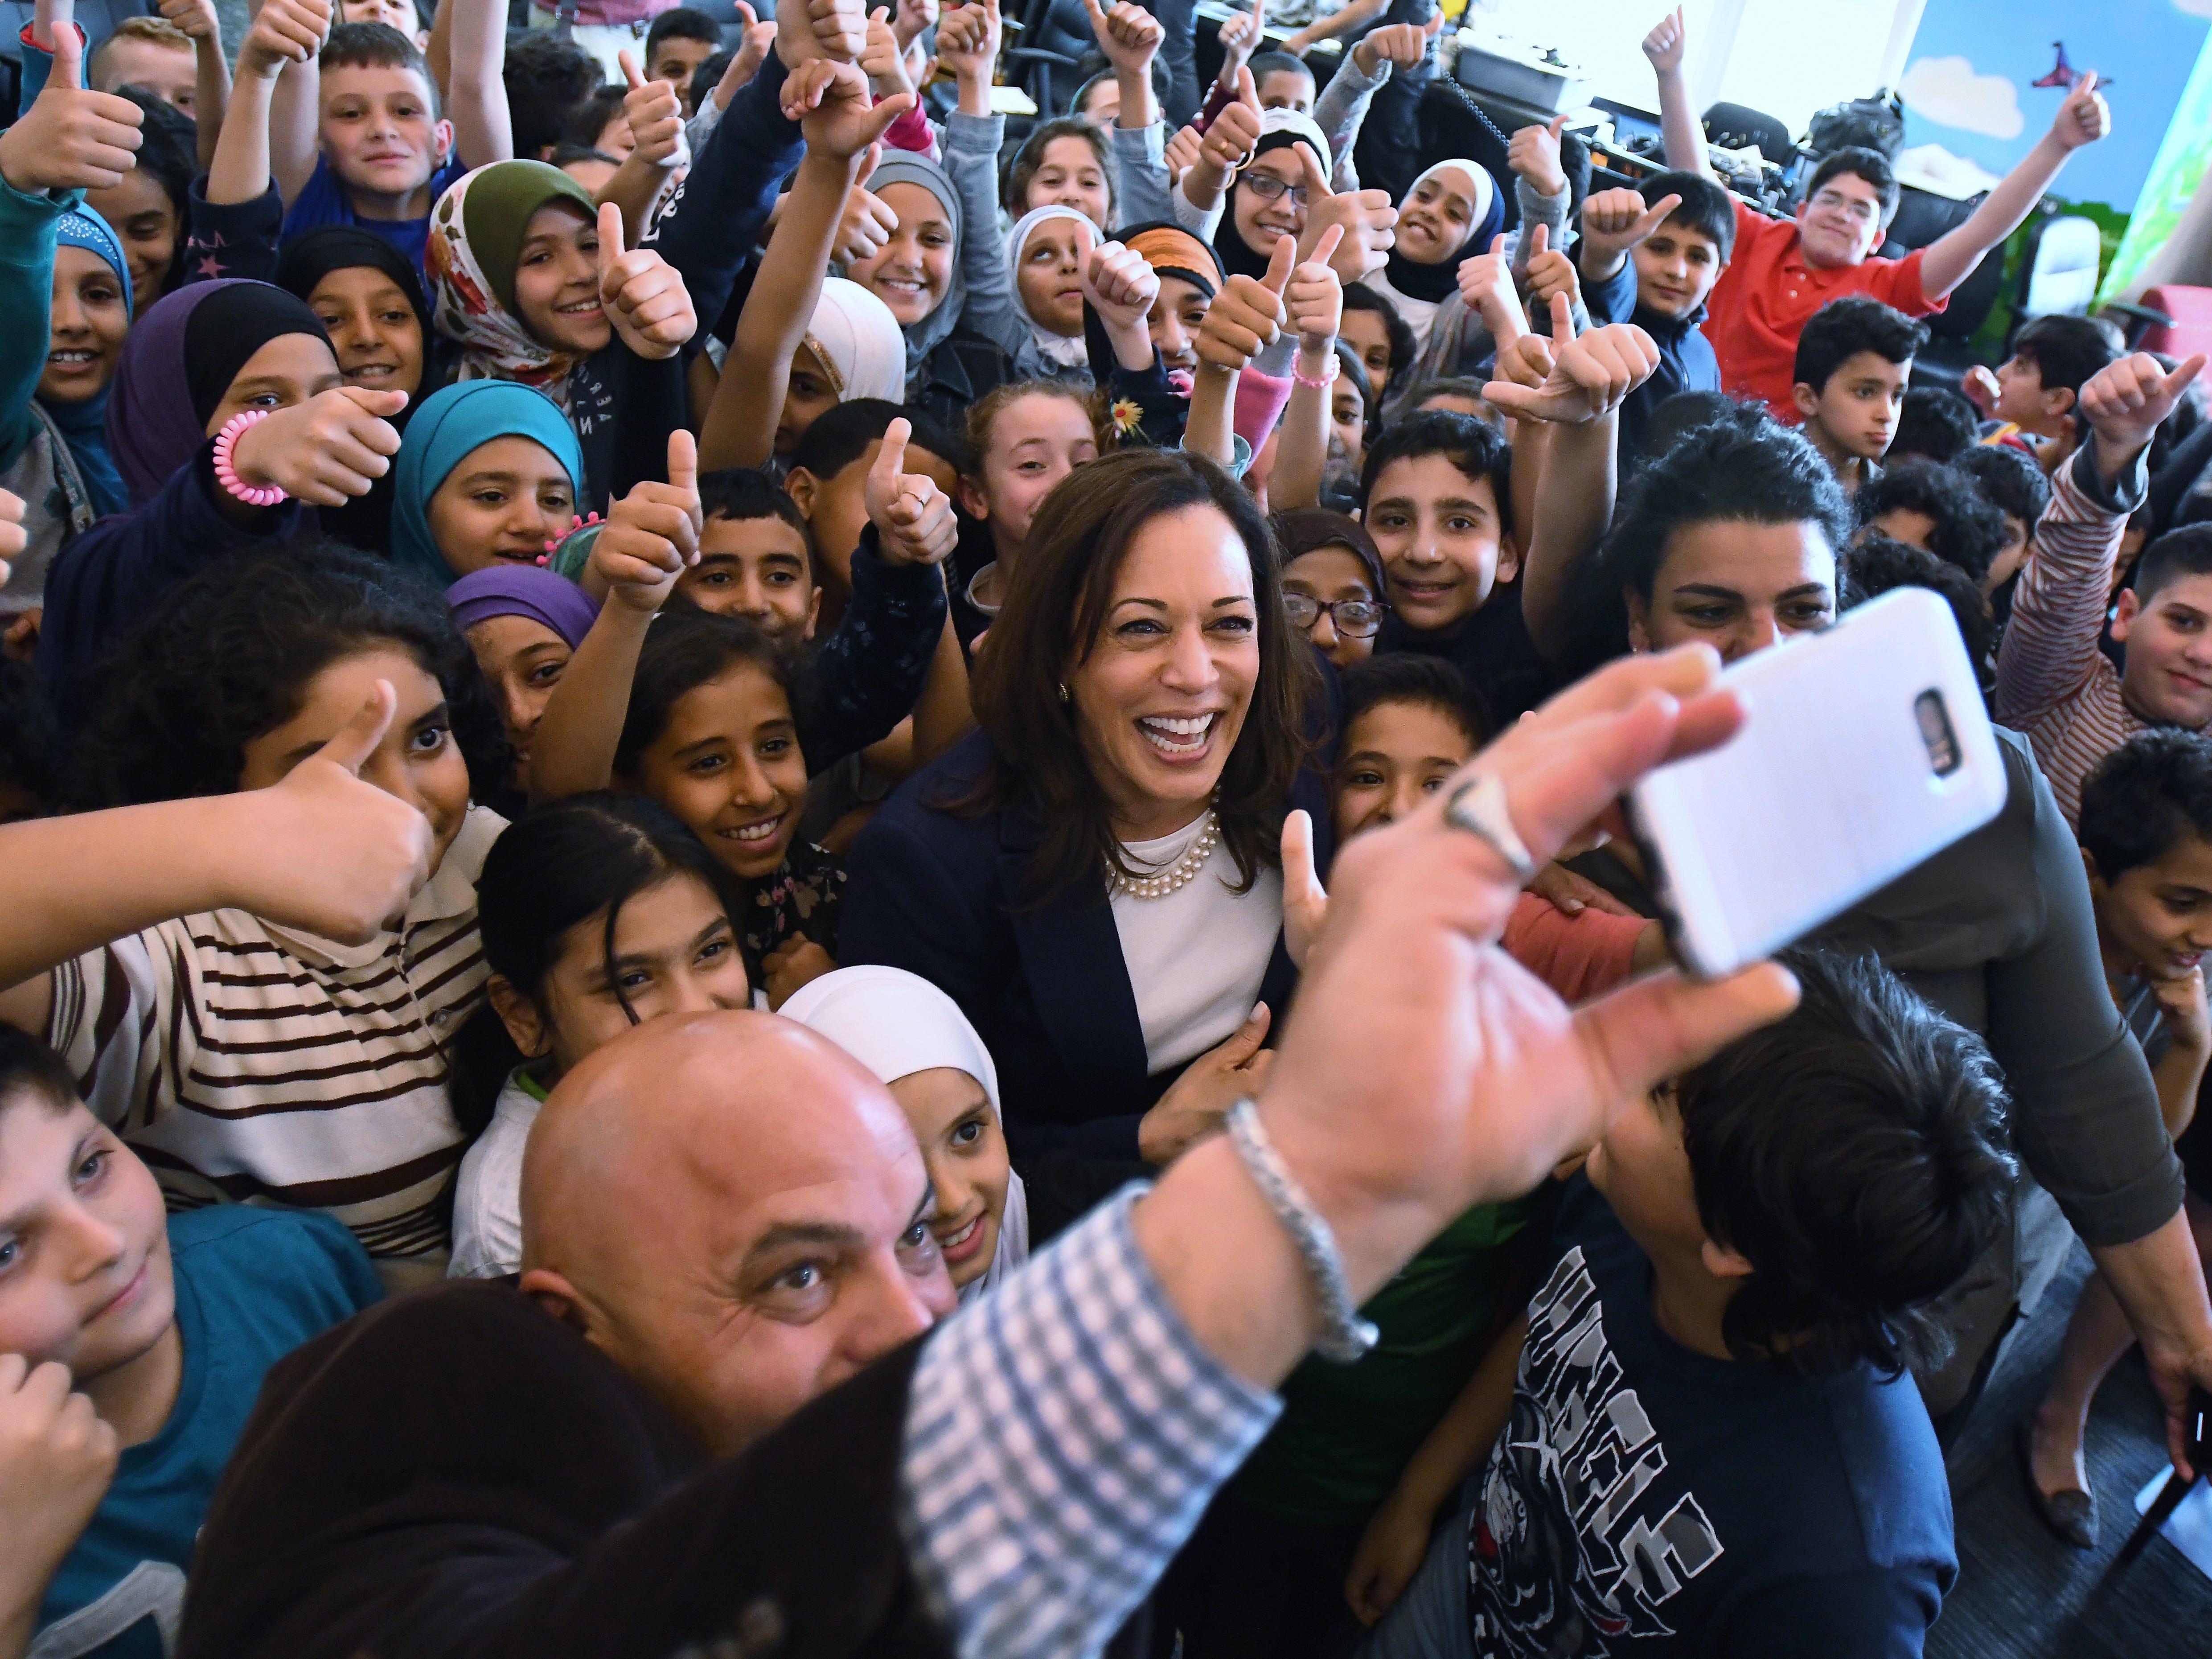 Miller Elementary principal Radwan Awada takes a 'selfie' with U.S. Senator Kamala Harris and Dearborn 4th graders at Miller Elementary School.